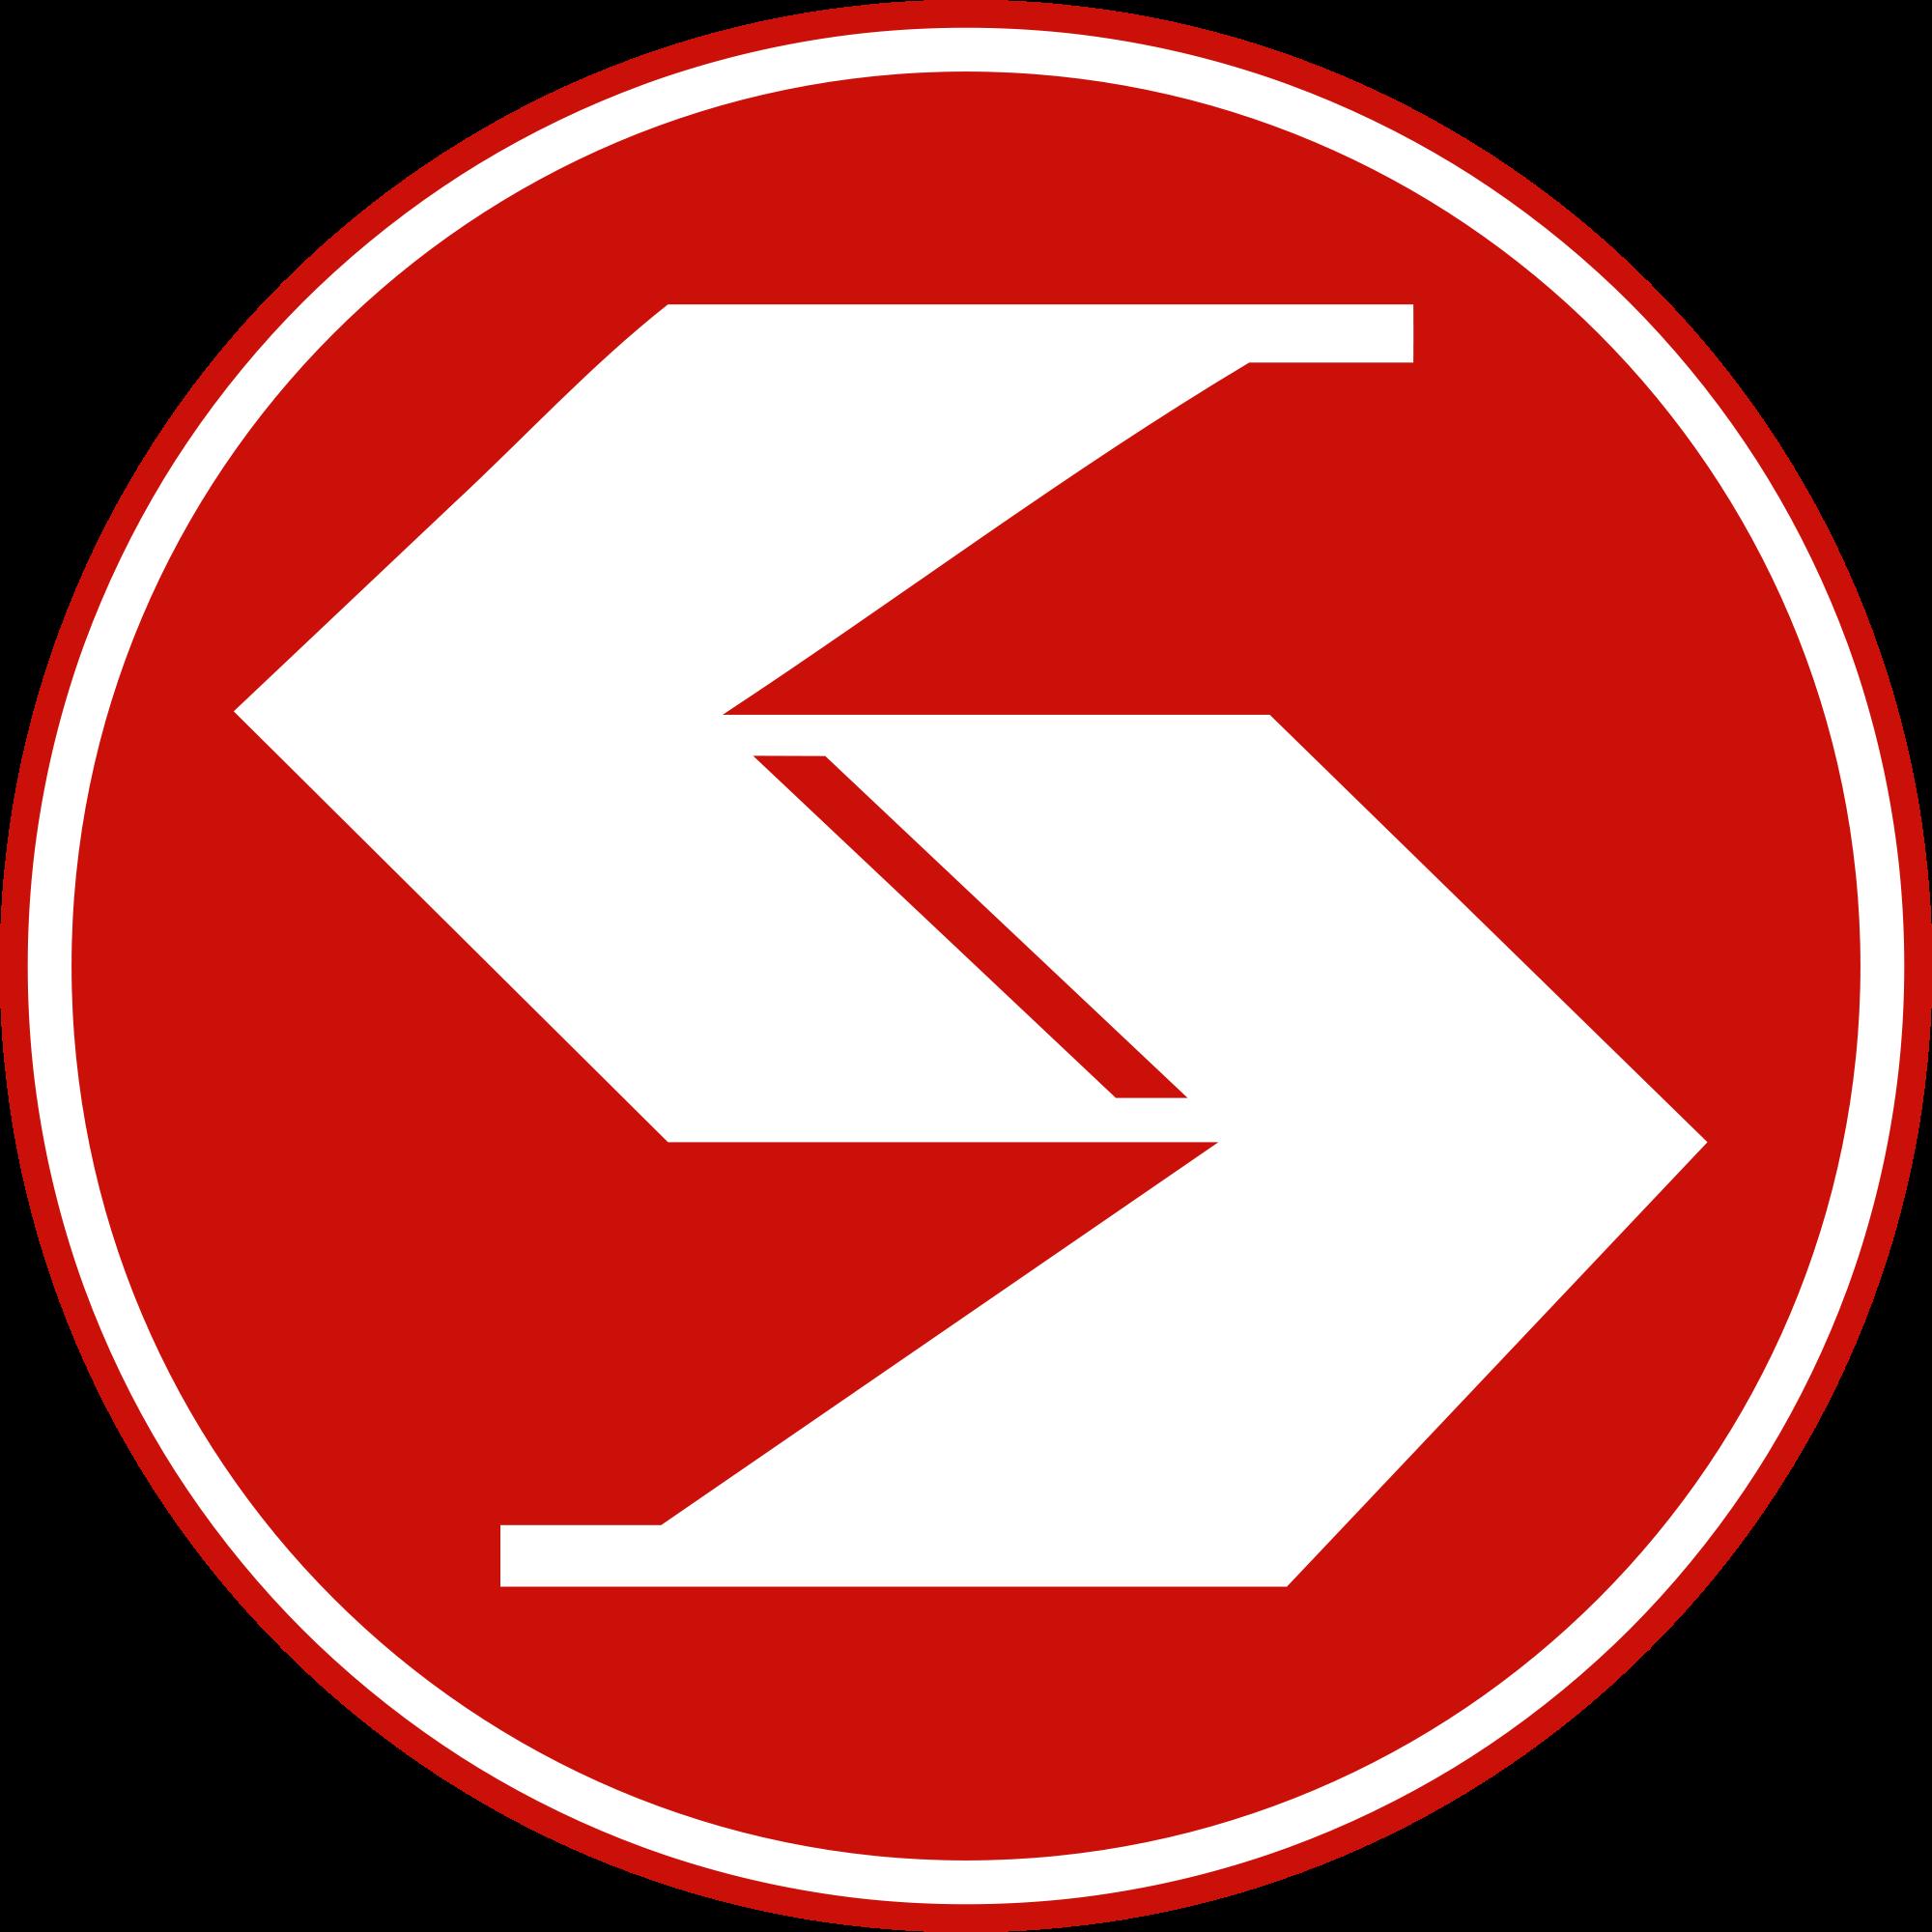 Cool cross logos